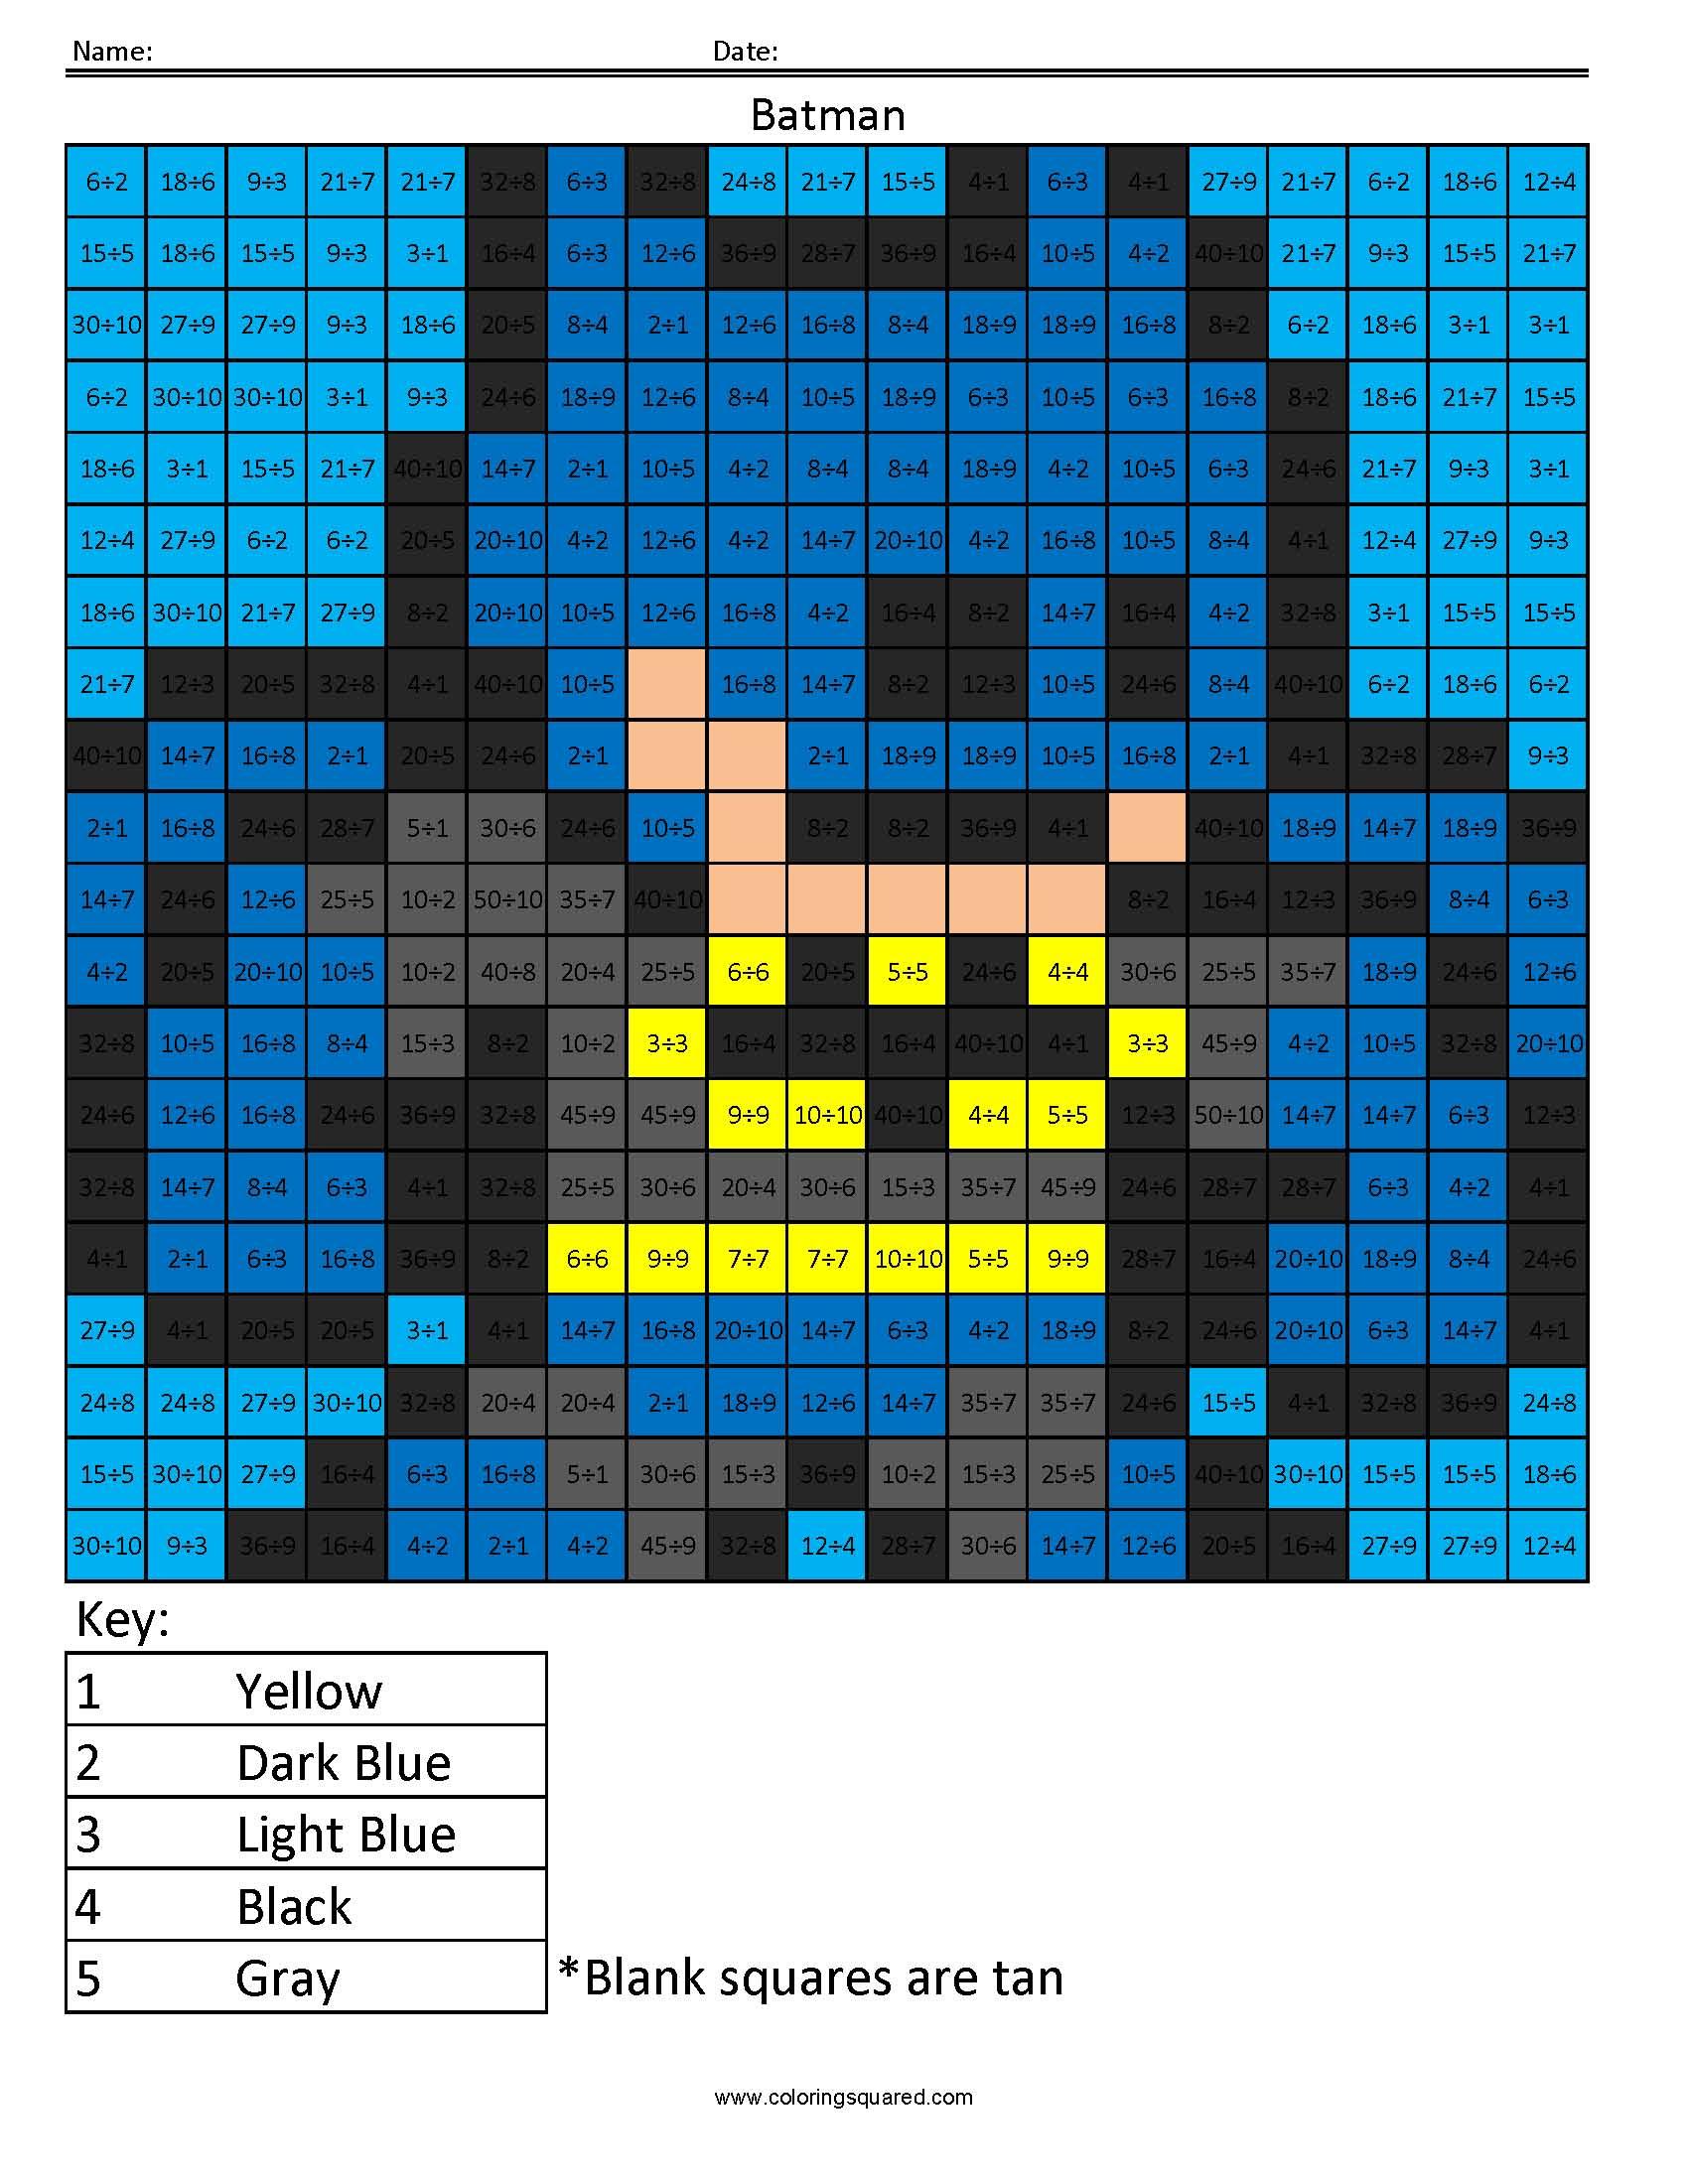 Batman Basic Division Coloring Squared